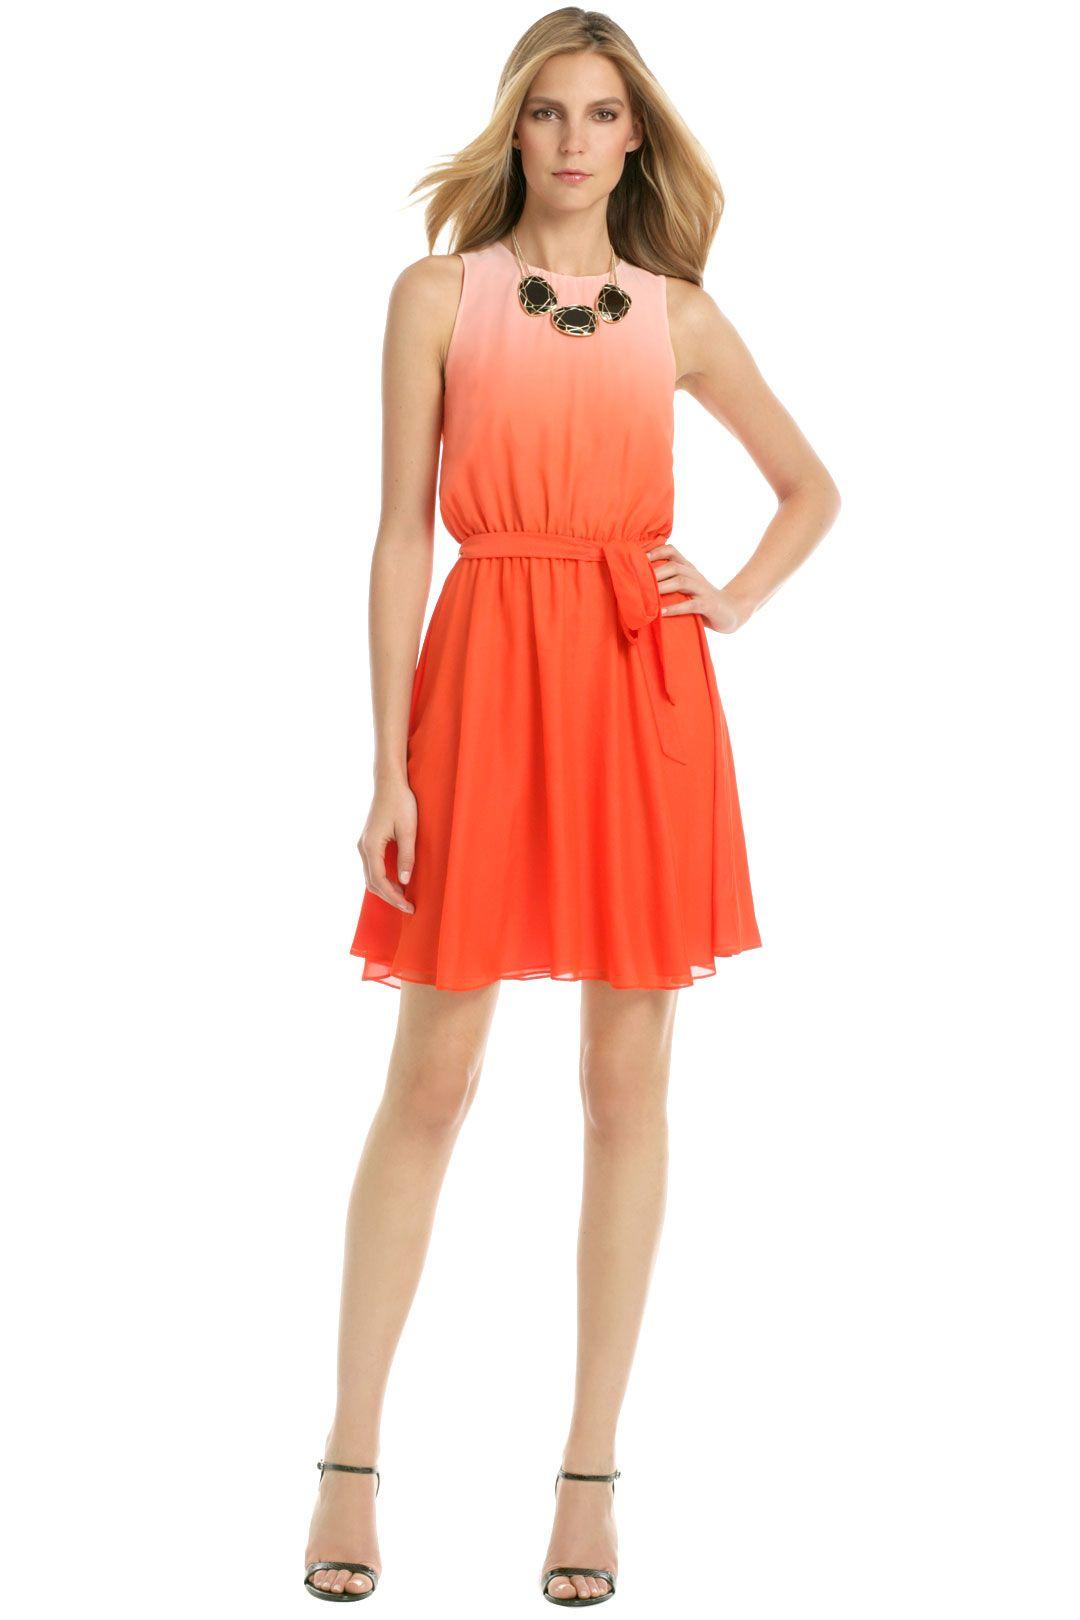 Malibu orange crush dress orange crush crushes and orange dress